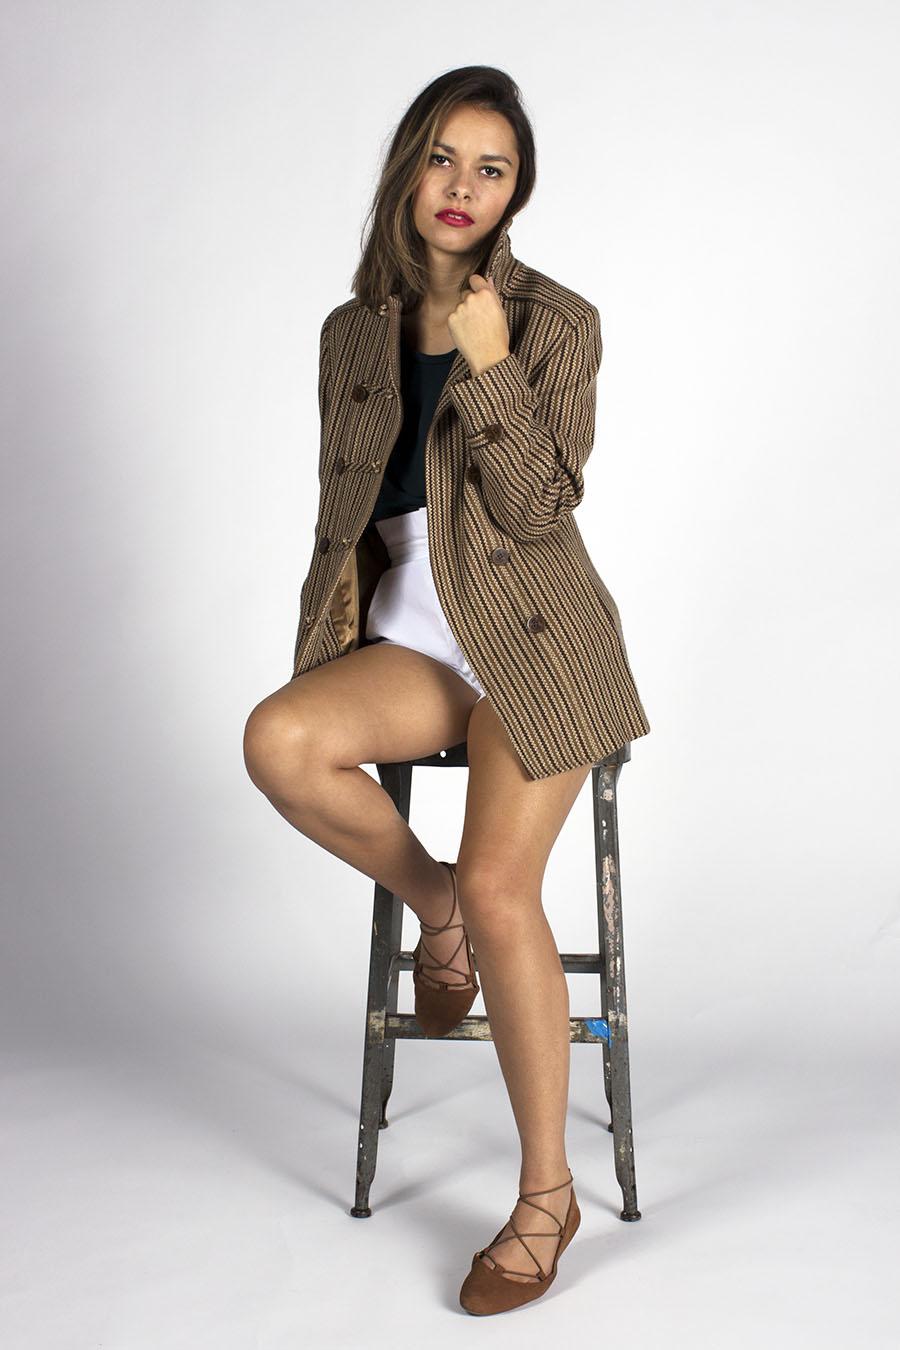 Sharon_Song_fashion_photography_millenial_professional_dres_Tony_Ward_Studio_women